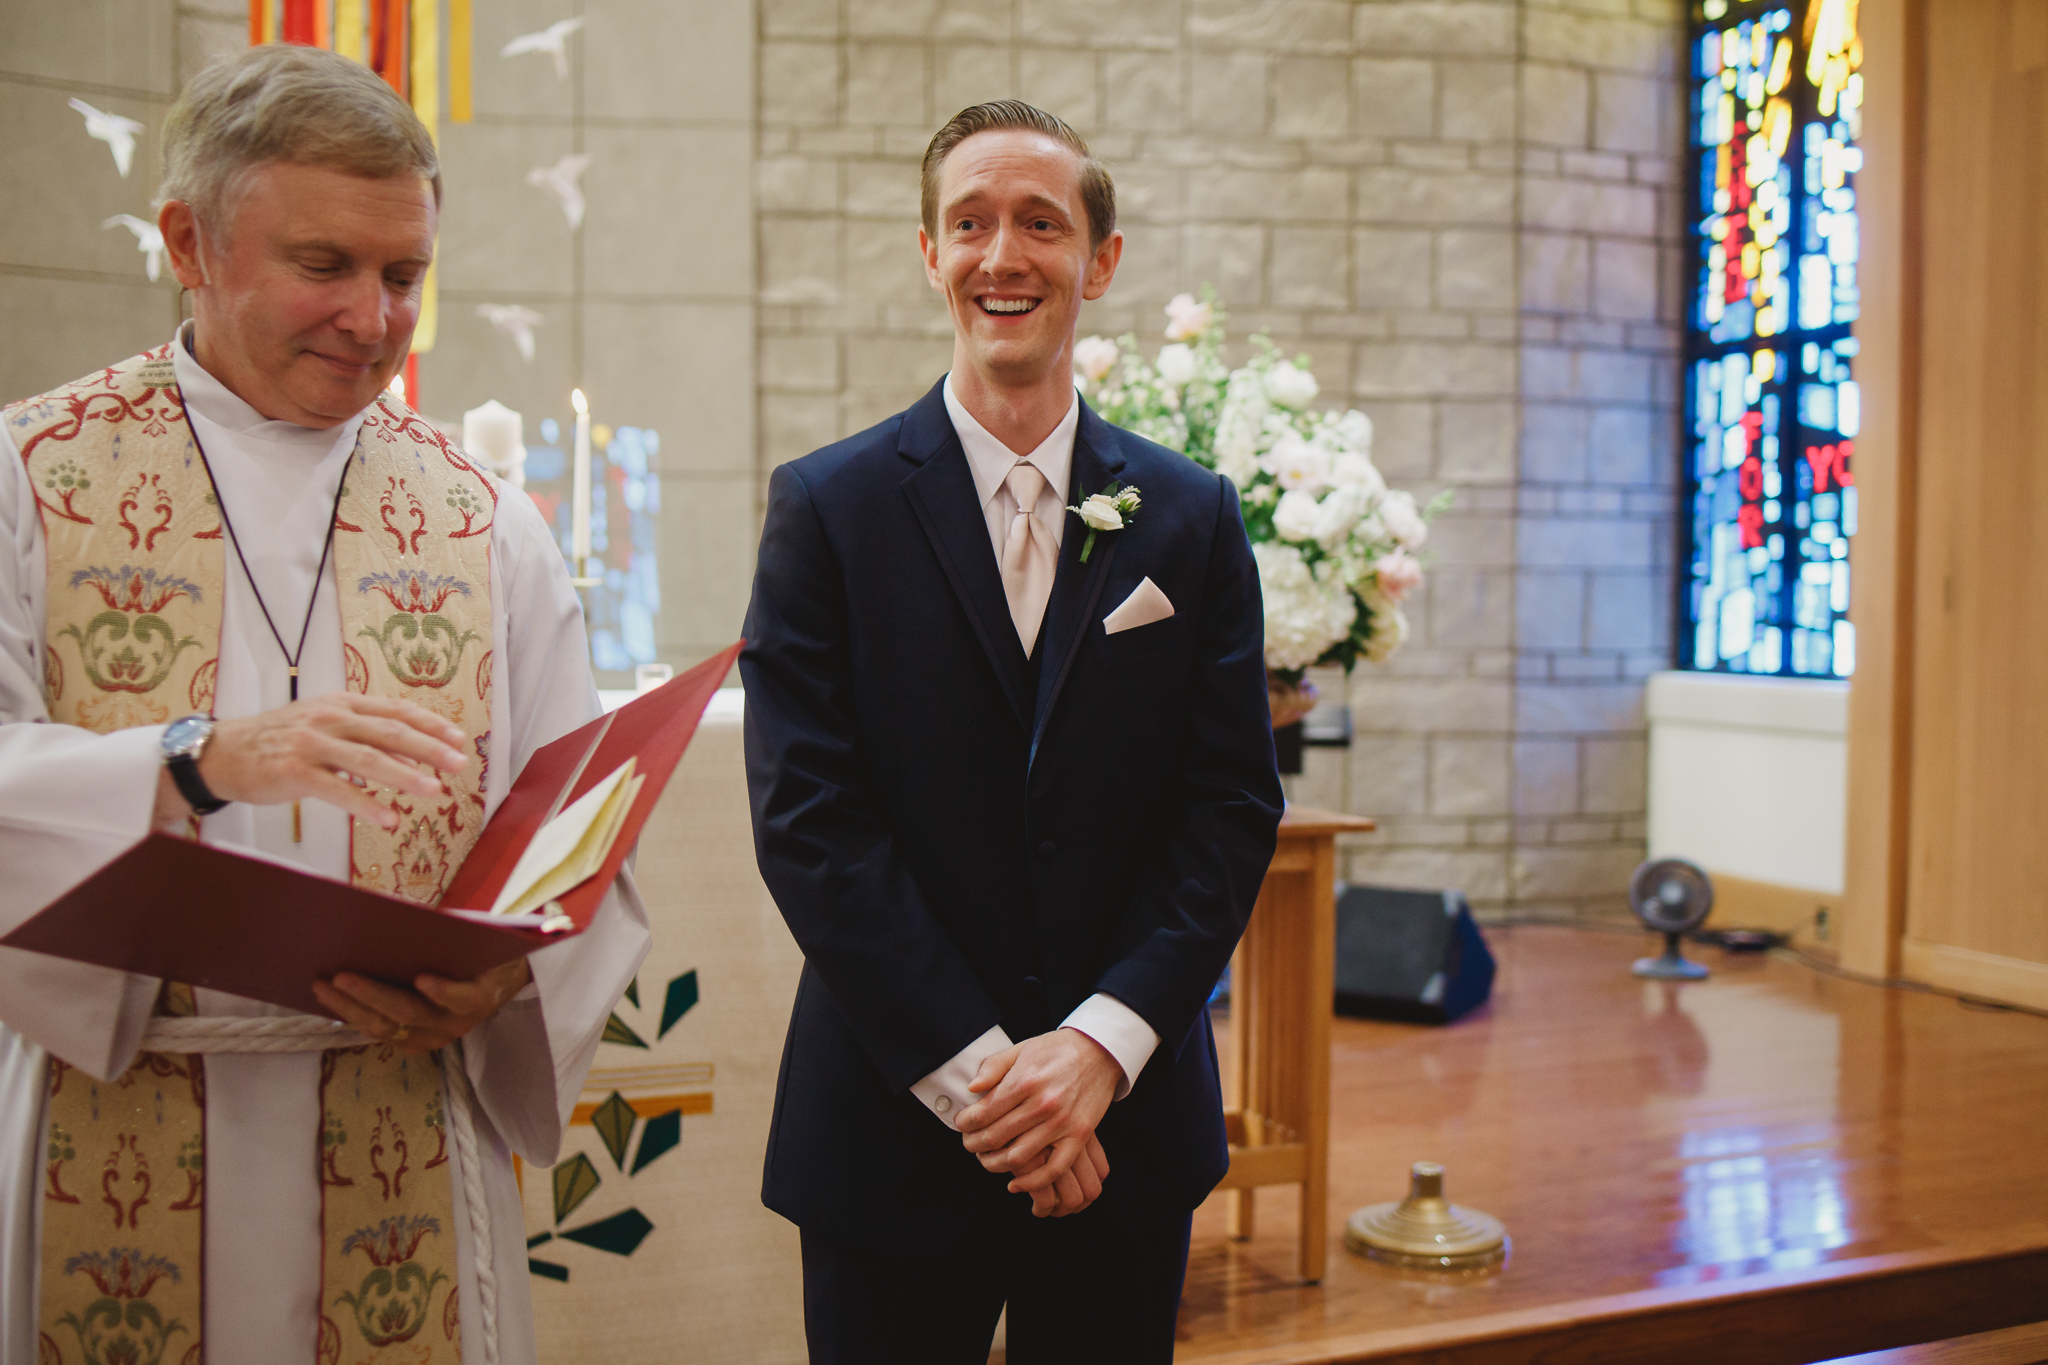 Michael and Kelly - the ashton depot - wedding DFW - wedding photographer- elizalde photography (26 of 150).jpg